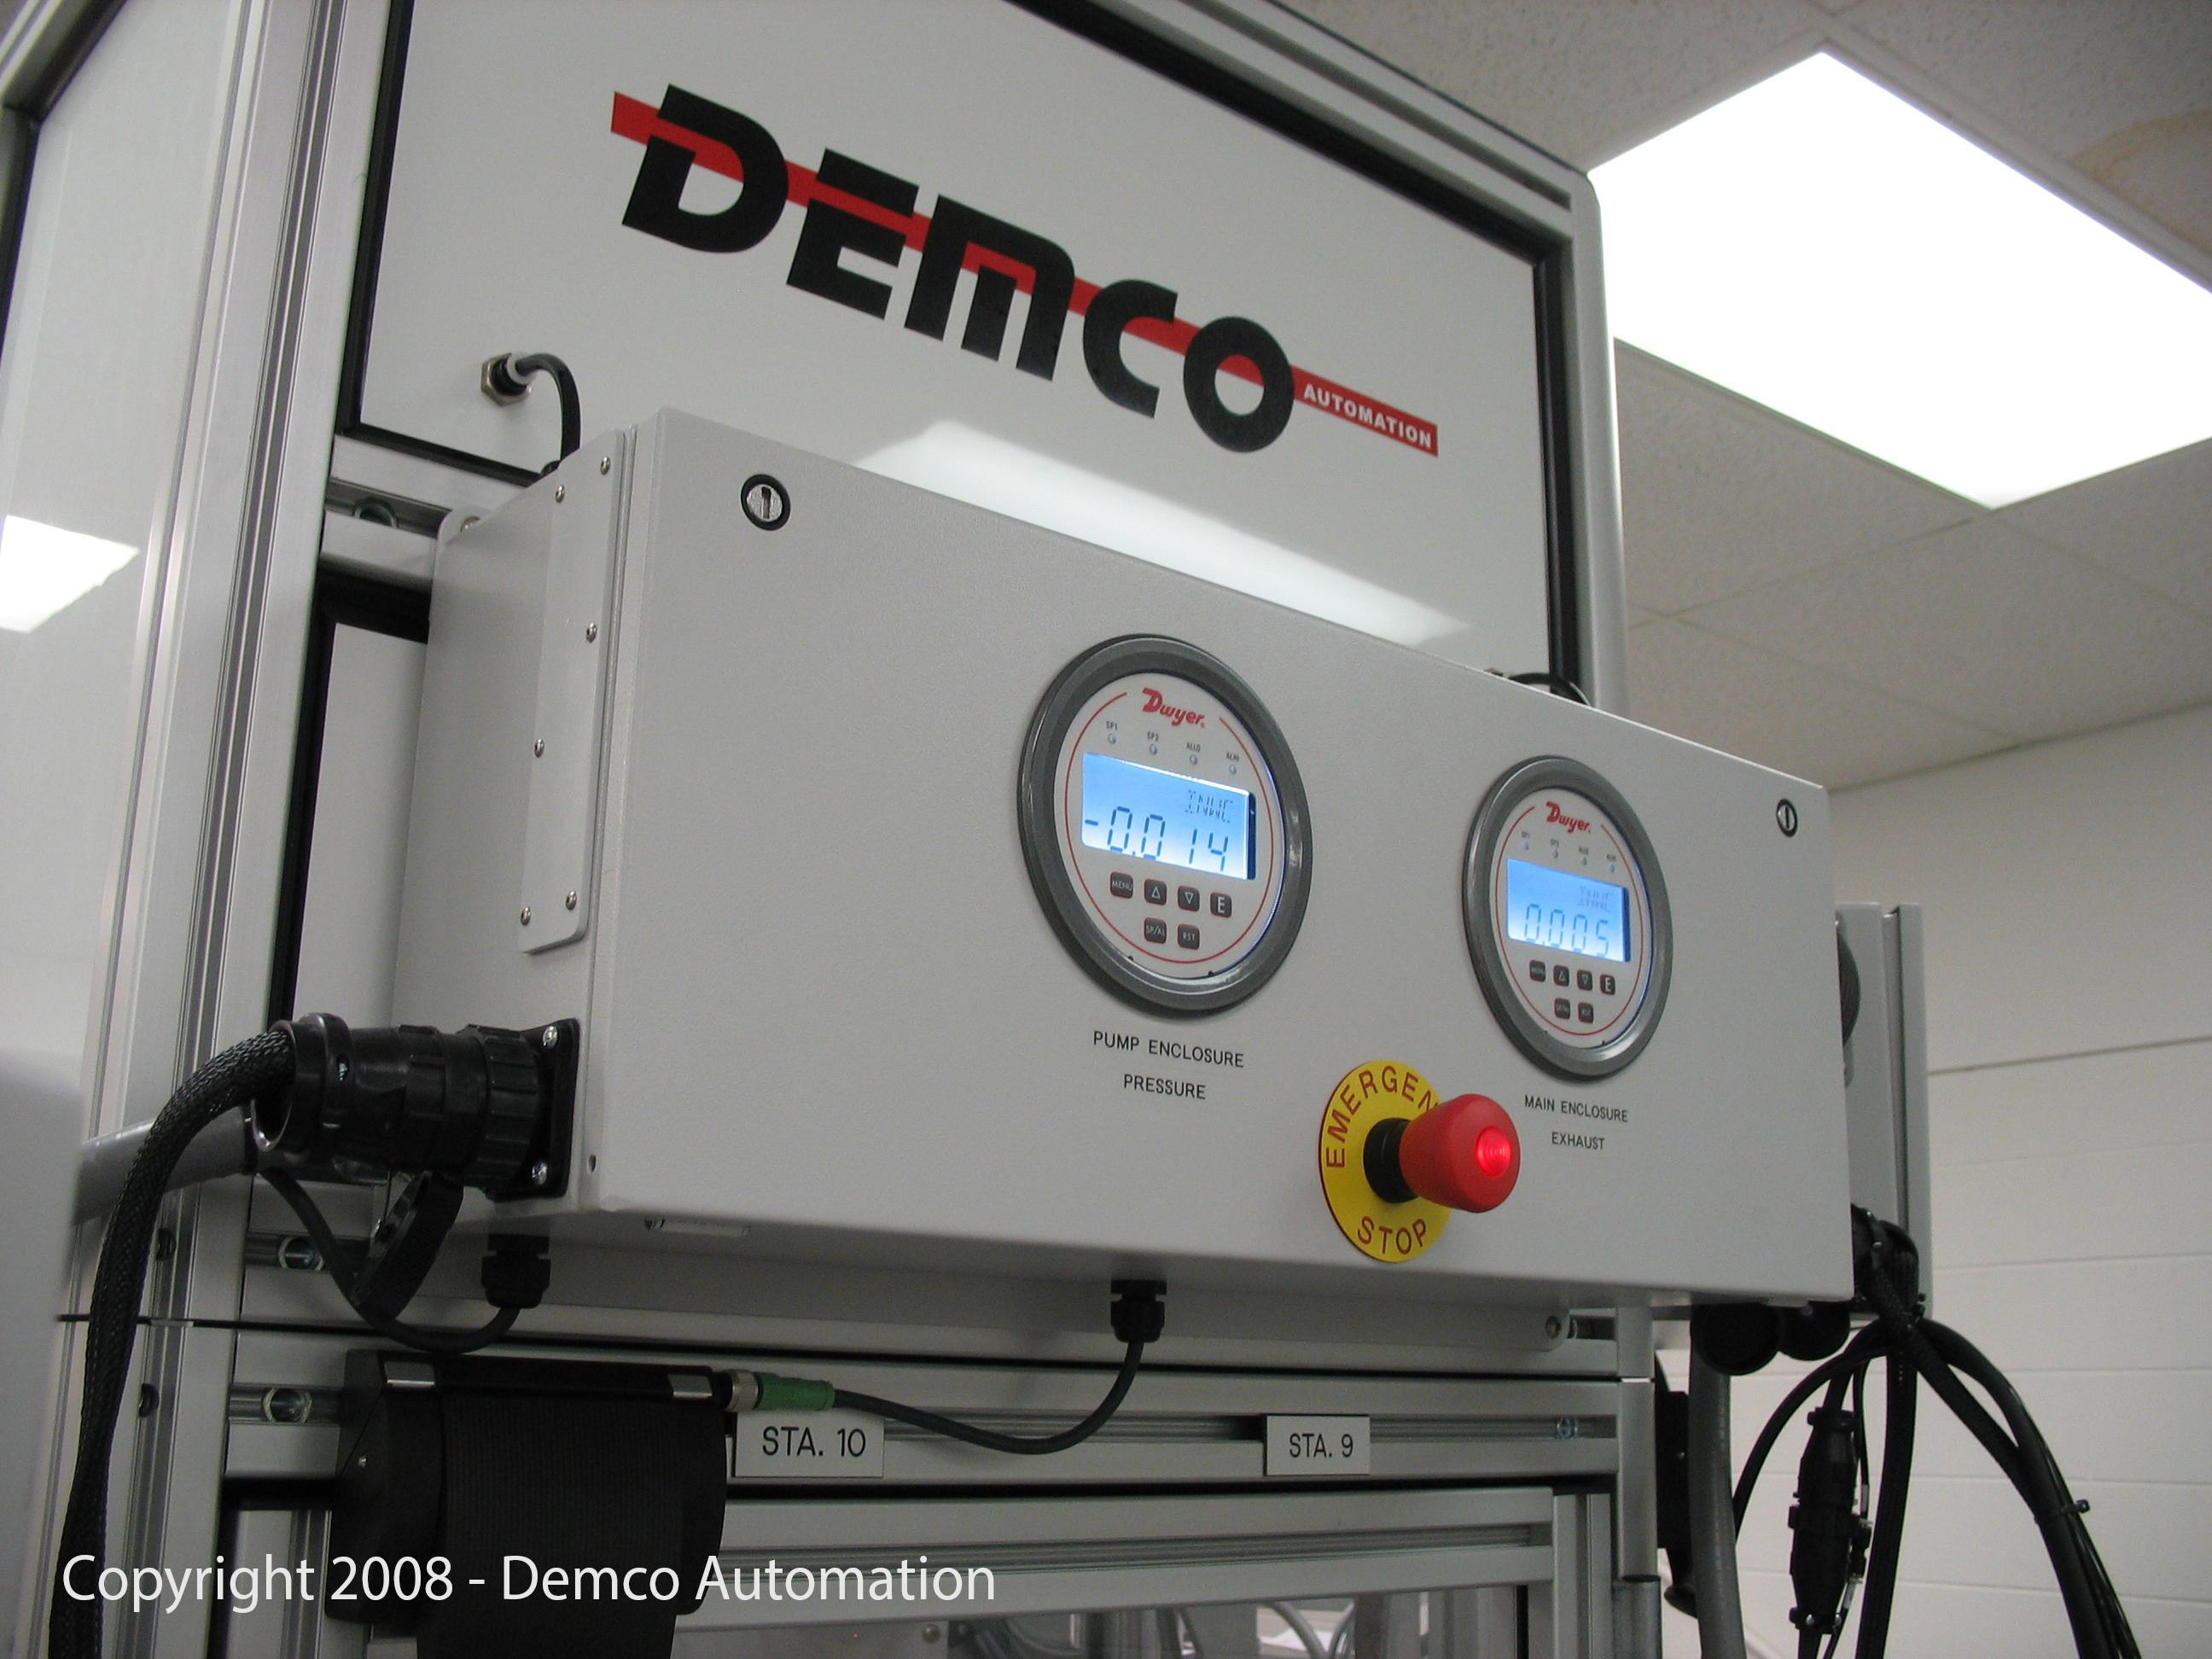 Demco Automation image 2